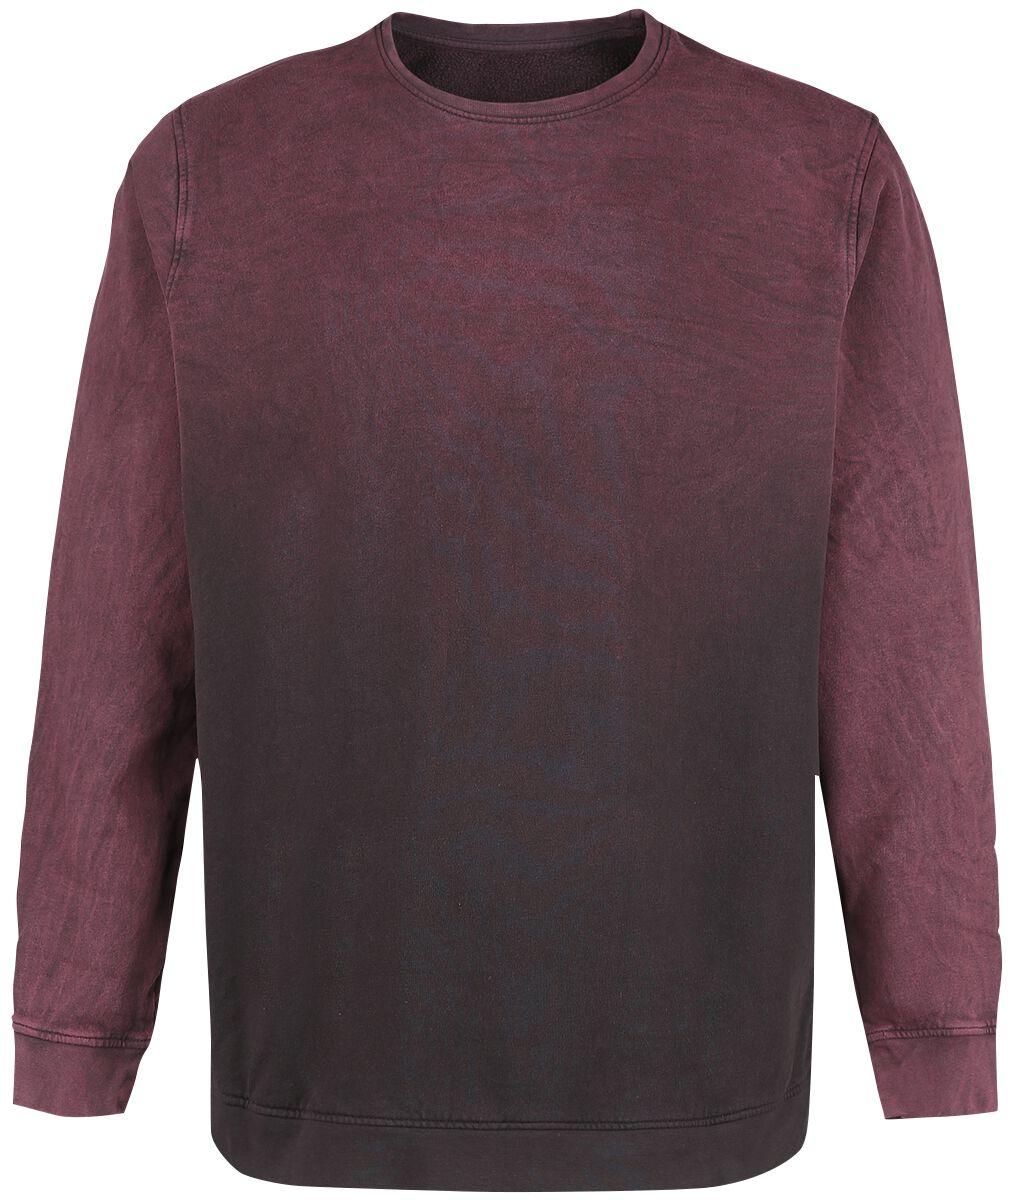 Outer Vision Man's Sweat Shirt Joe Sweatshirt weinrot 10657-OV Man's Sweat-Shirt Joe calipo wine